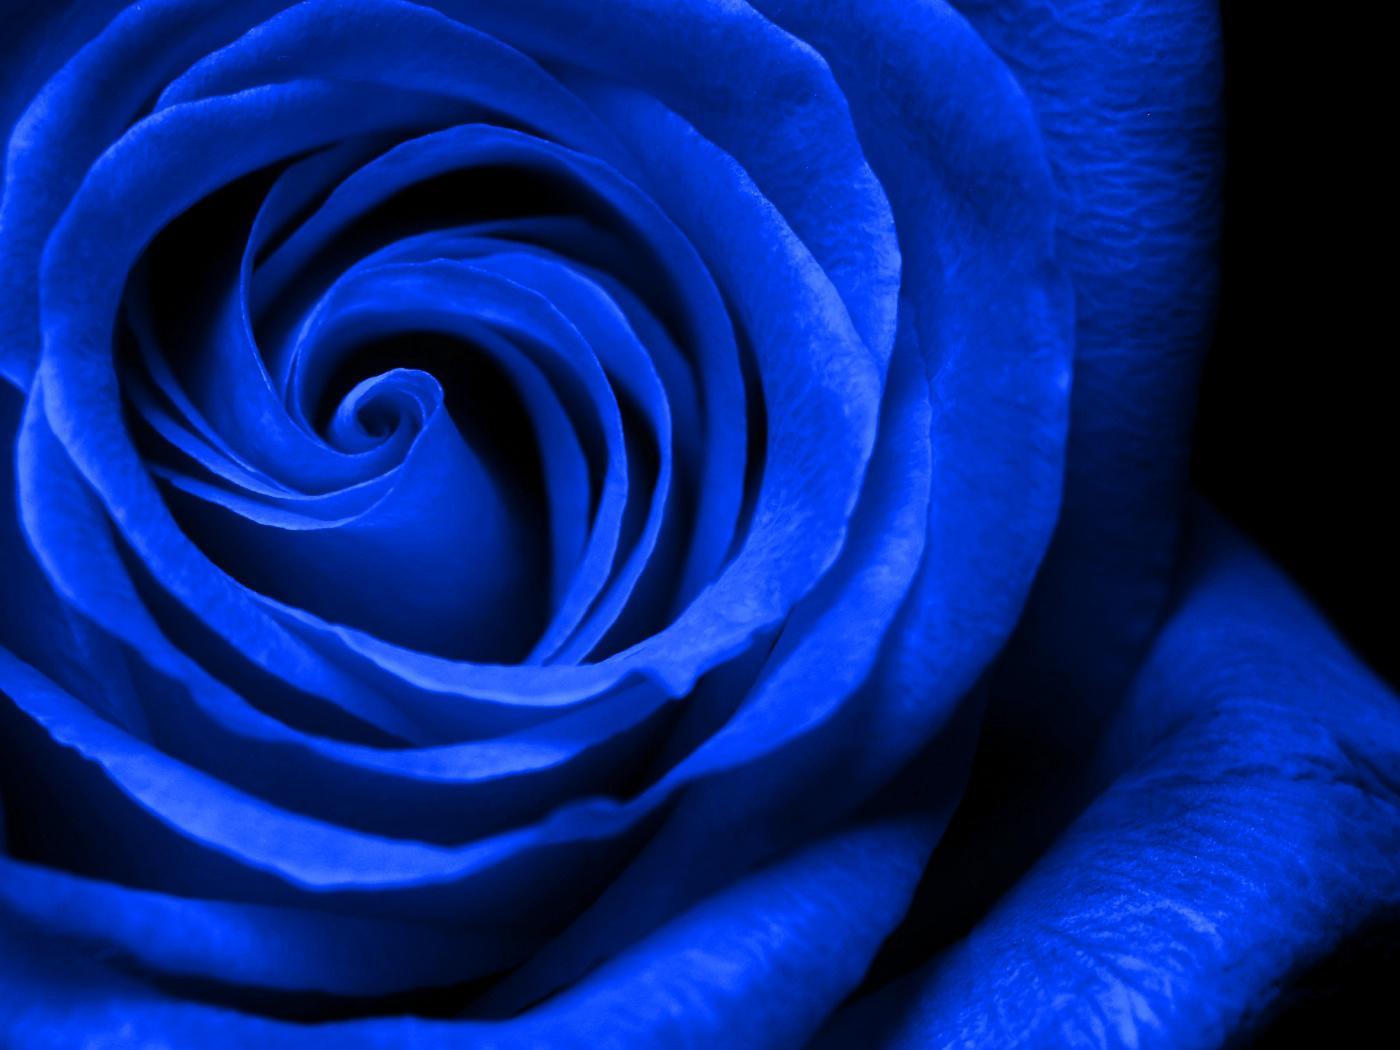 royal blue wallpapers - sf wallpaper